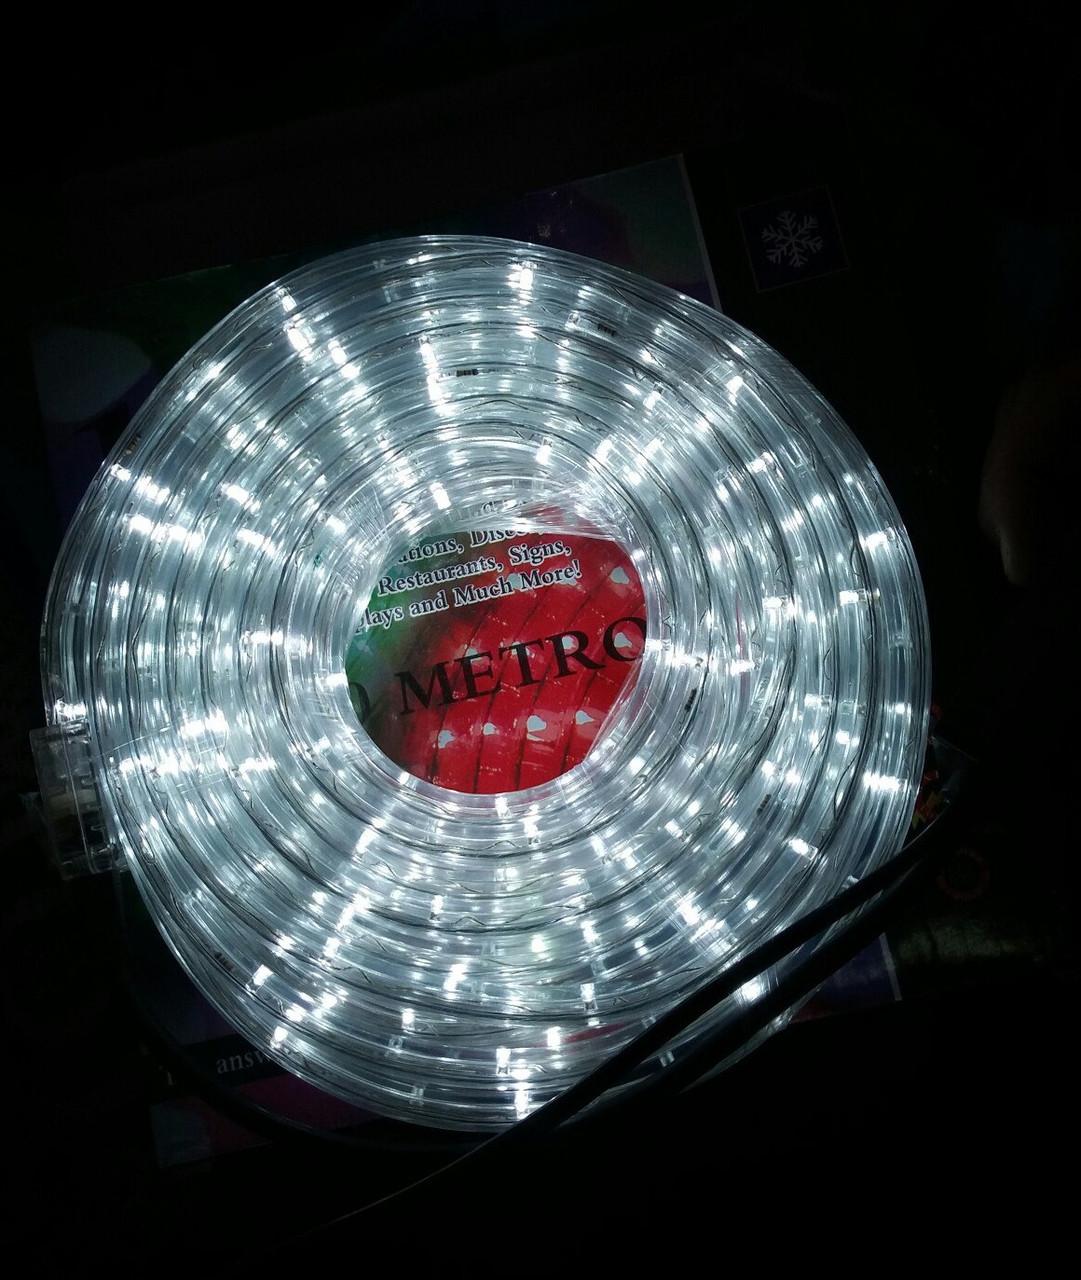 Гирлянда уличная лента светодиодная белая (LED) 10 м